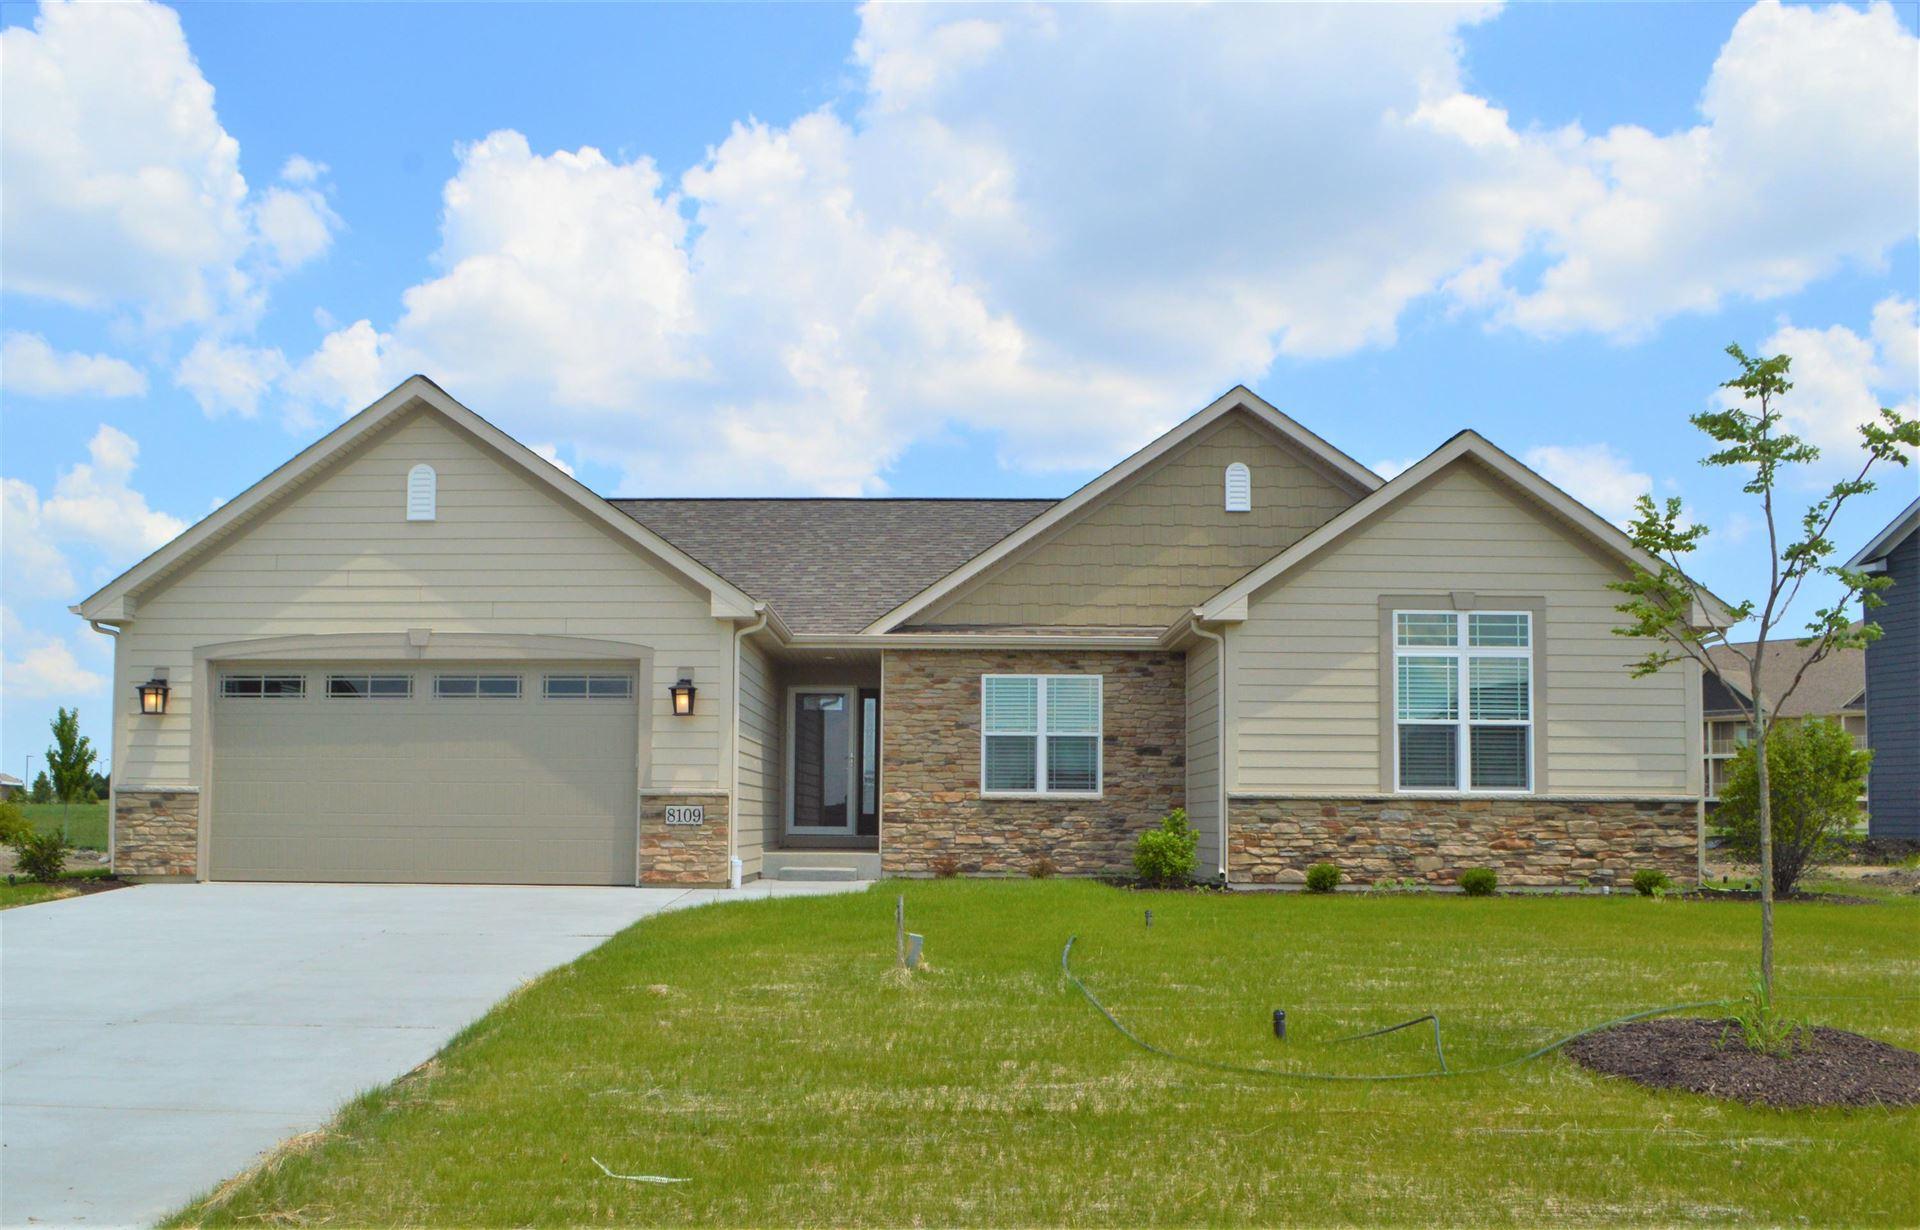 8109 Ridgeway Ct, Pleasant Prairie, WI 53158 - #: 1697452